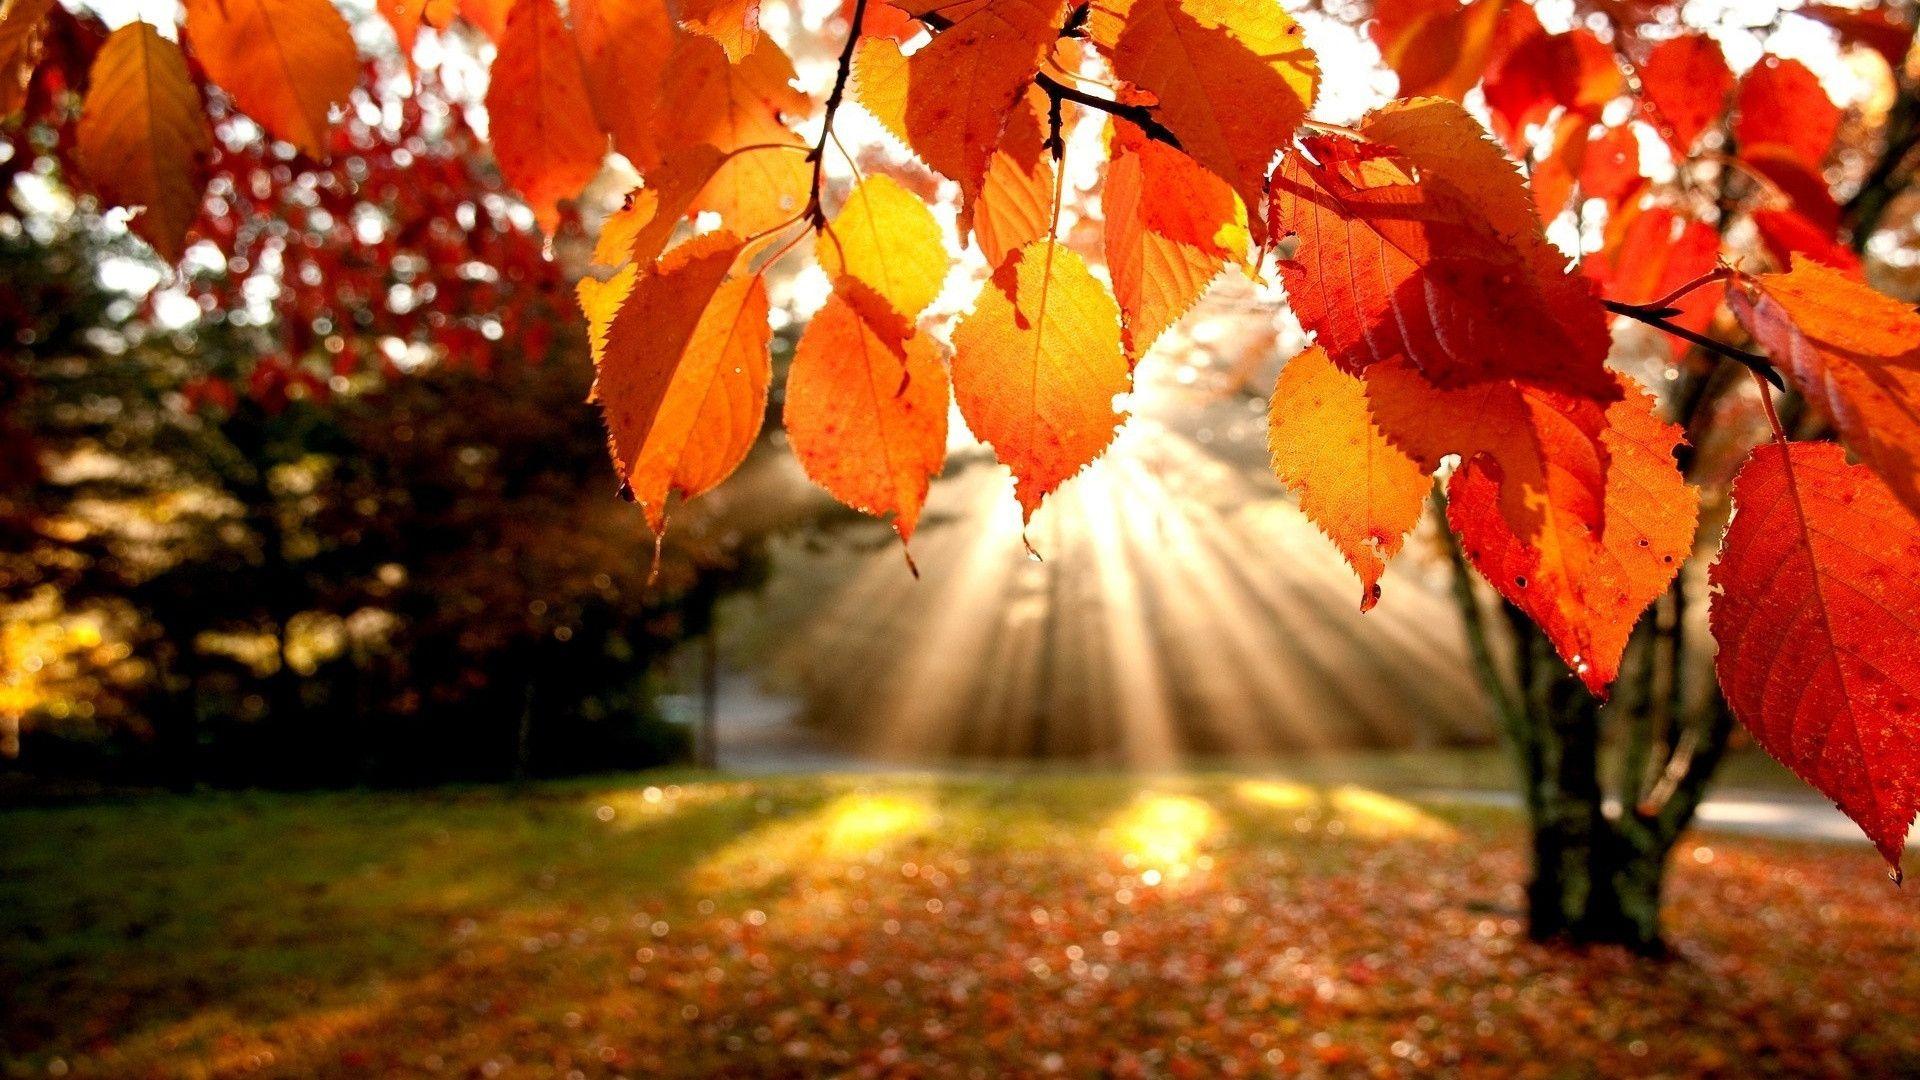 Autumn Leaves Wallpaper - Bhstorm com